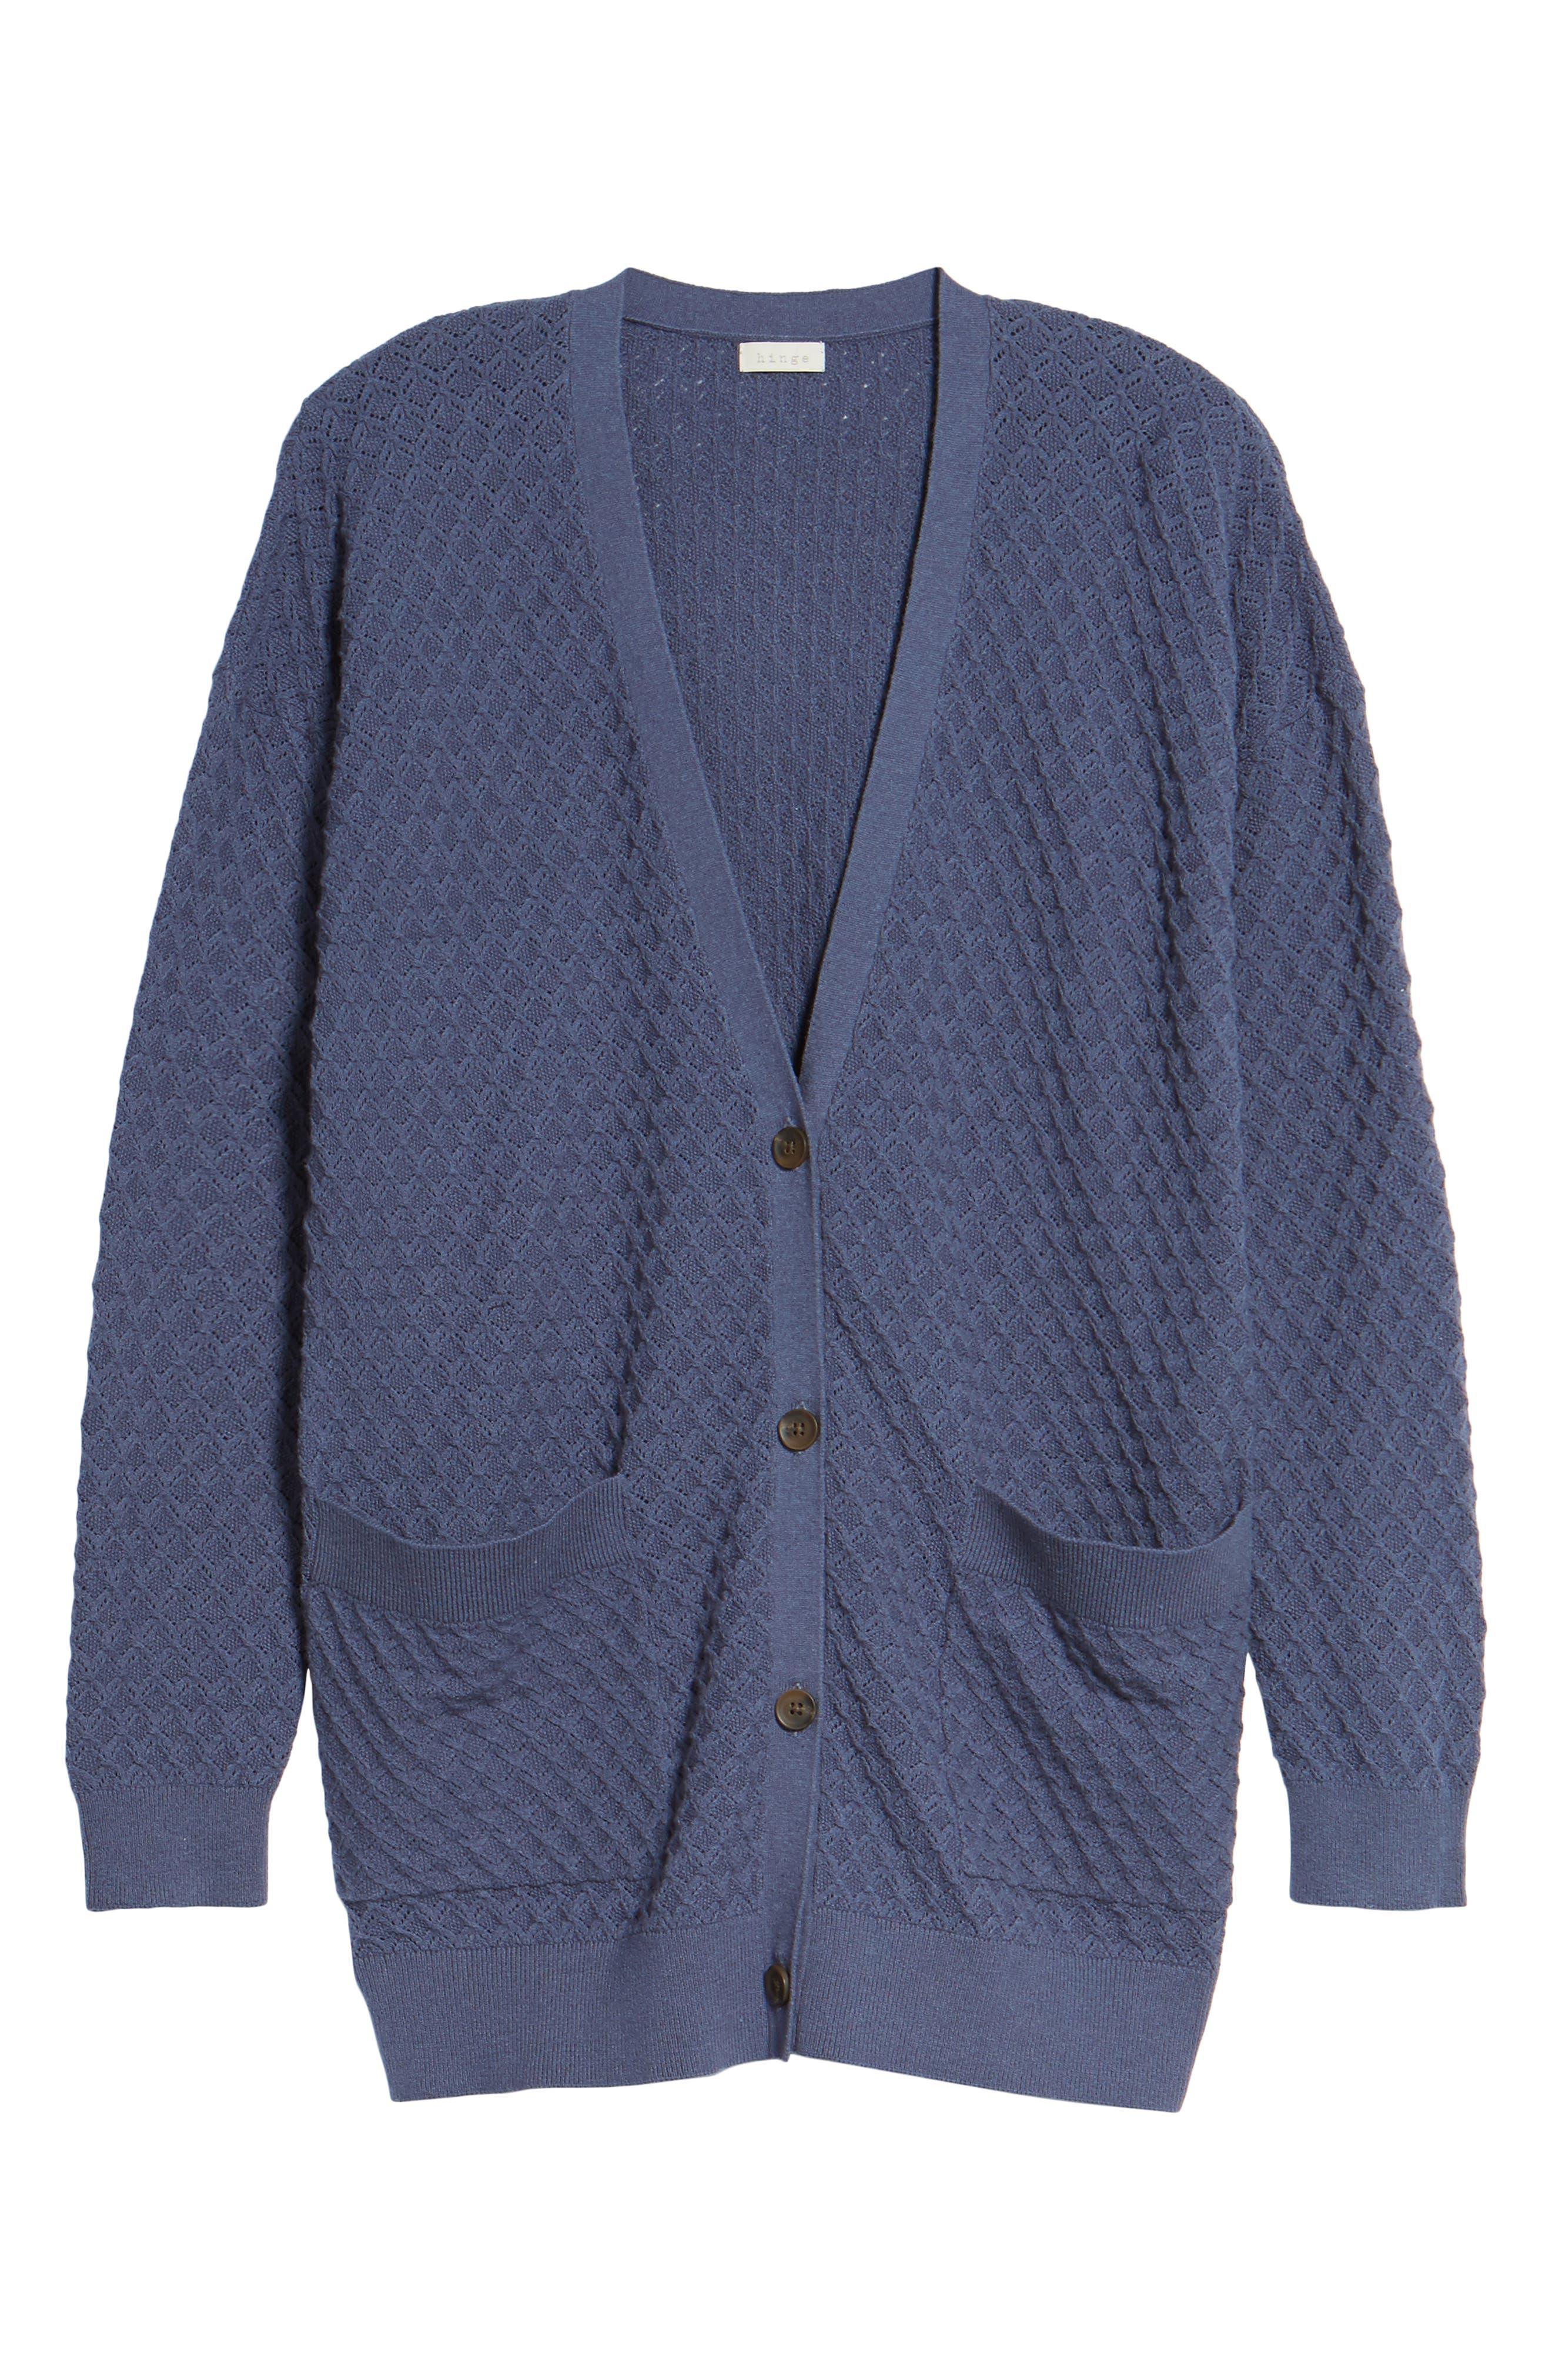 Pointelle Cardigan Sweater,                             Alternate thumbnail 5, color,                             Blue Vintage